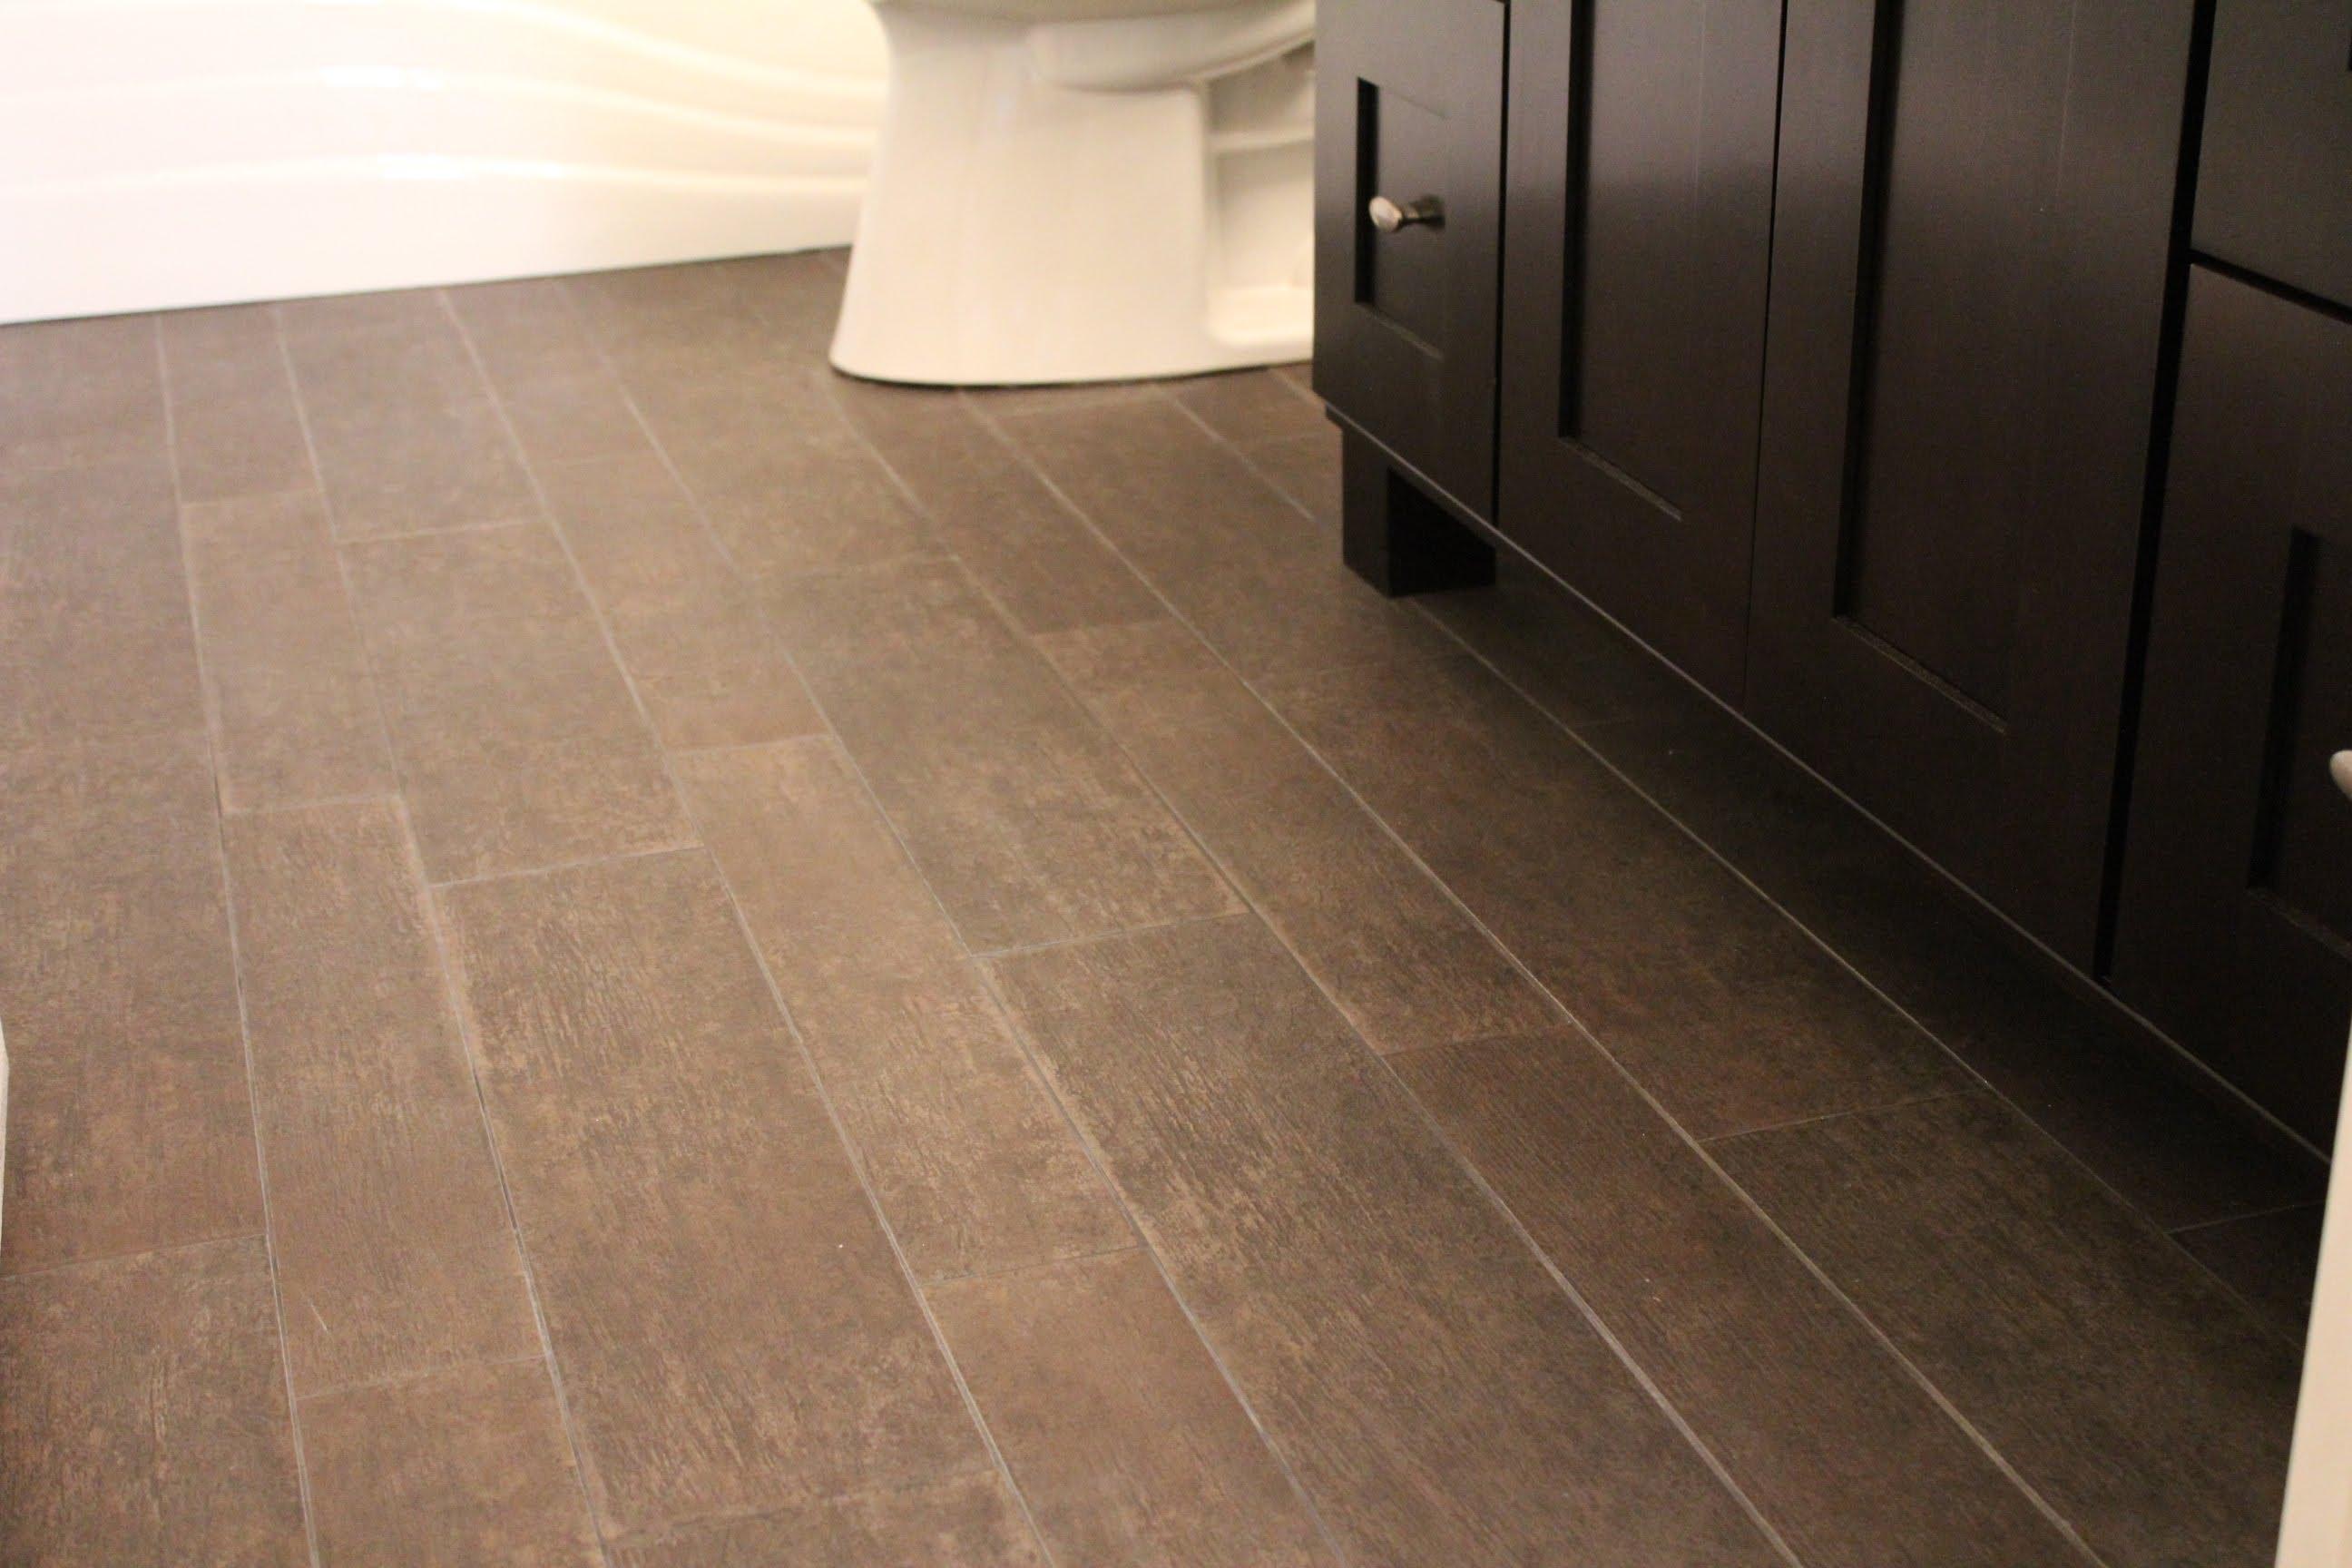 19 Stunning Ideas For Wood Like Ceramic Tile In Bathroom 2019